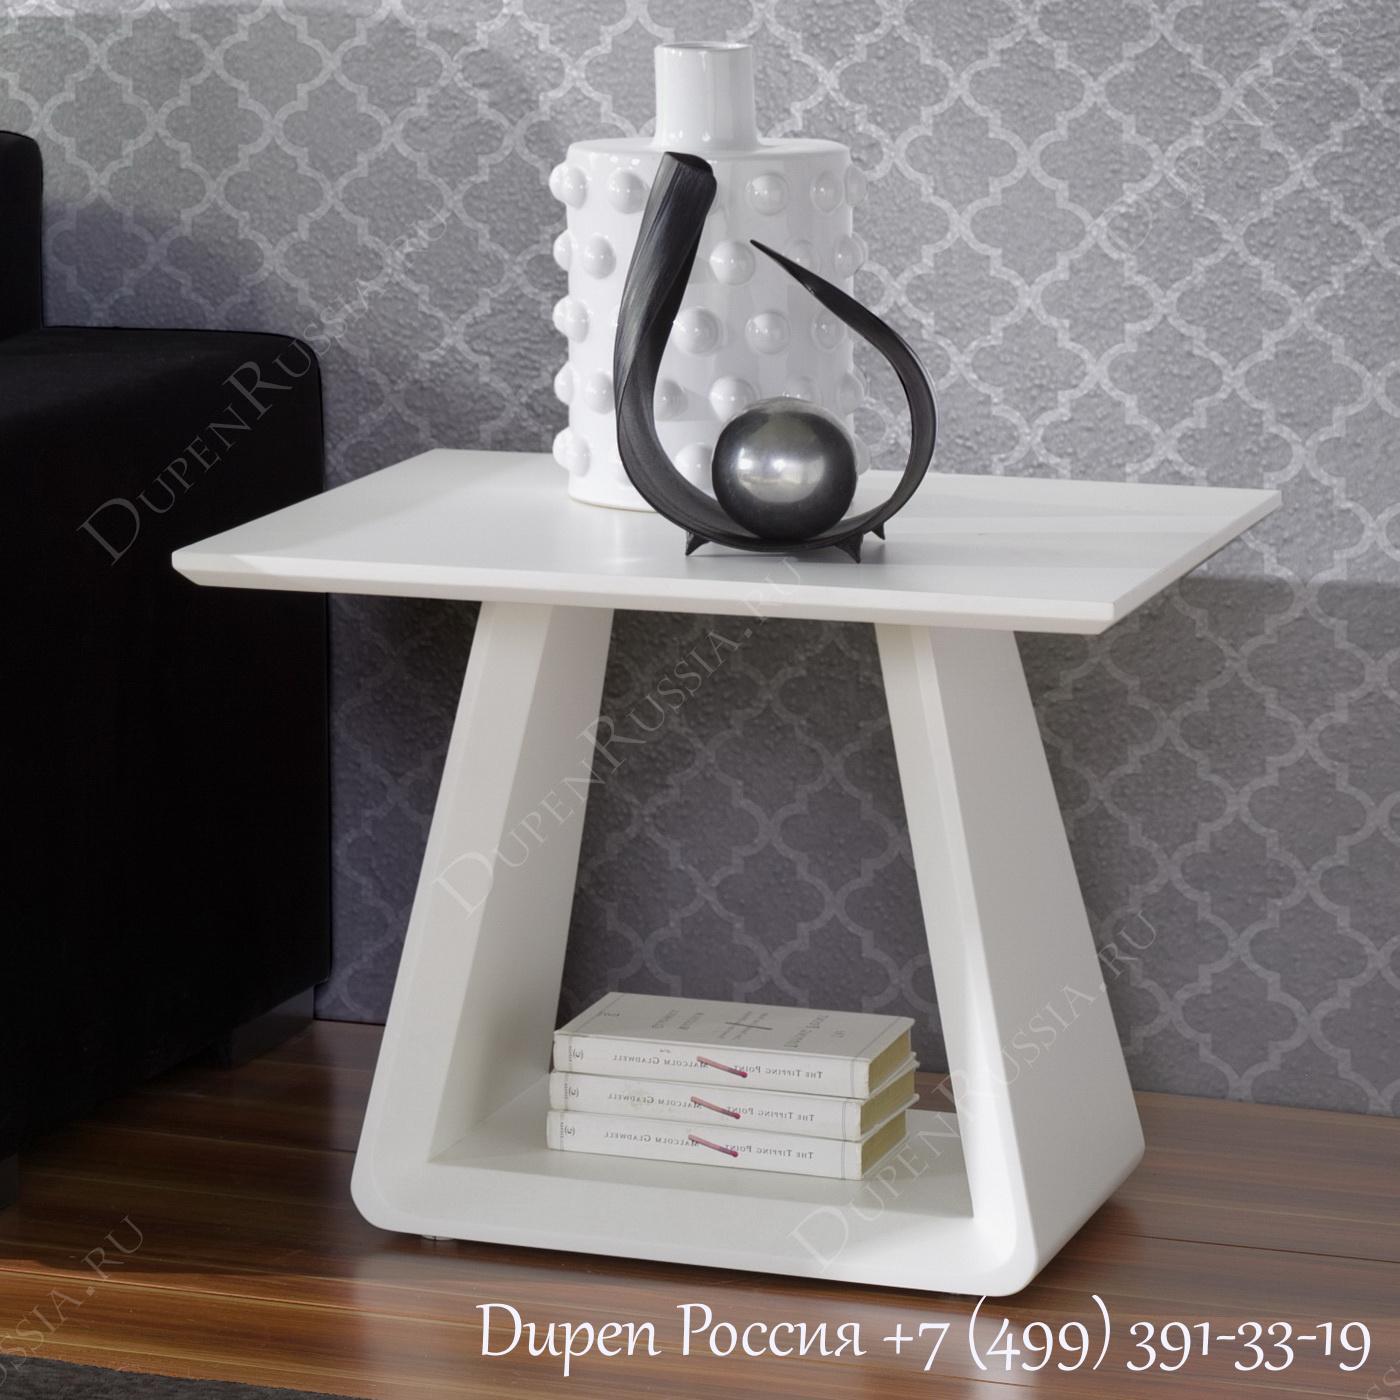 Журнальный стол DUPEN CT-223 Белый матовый